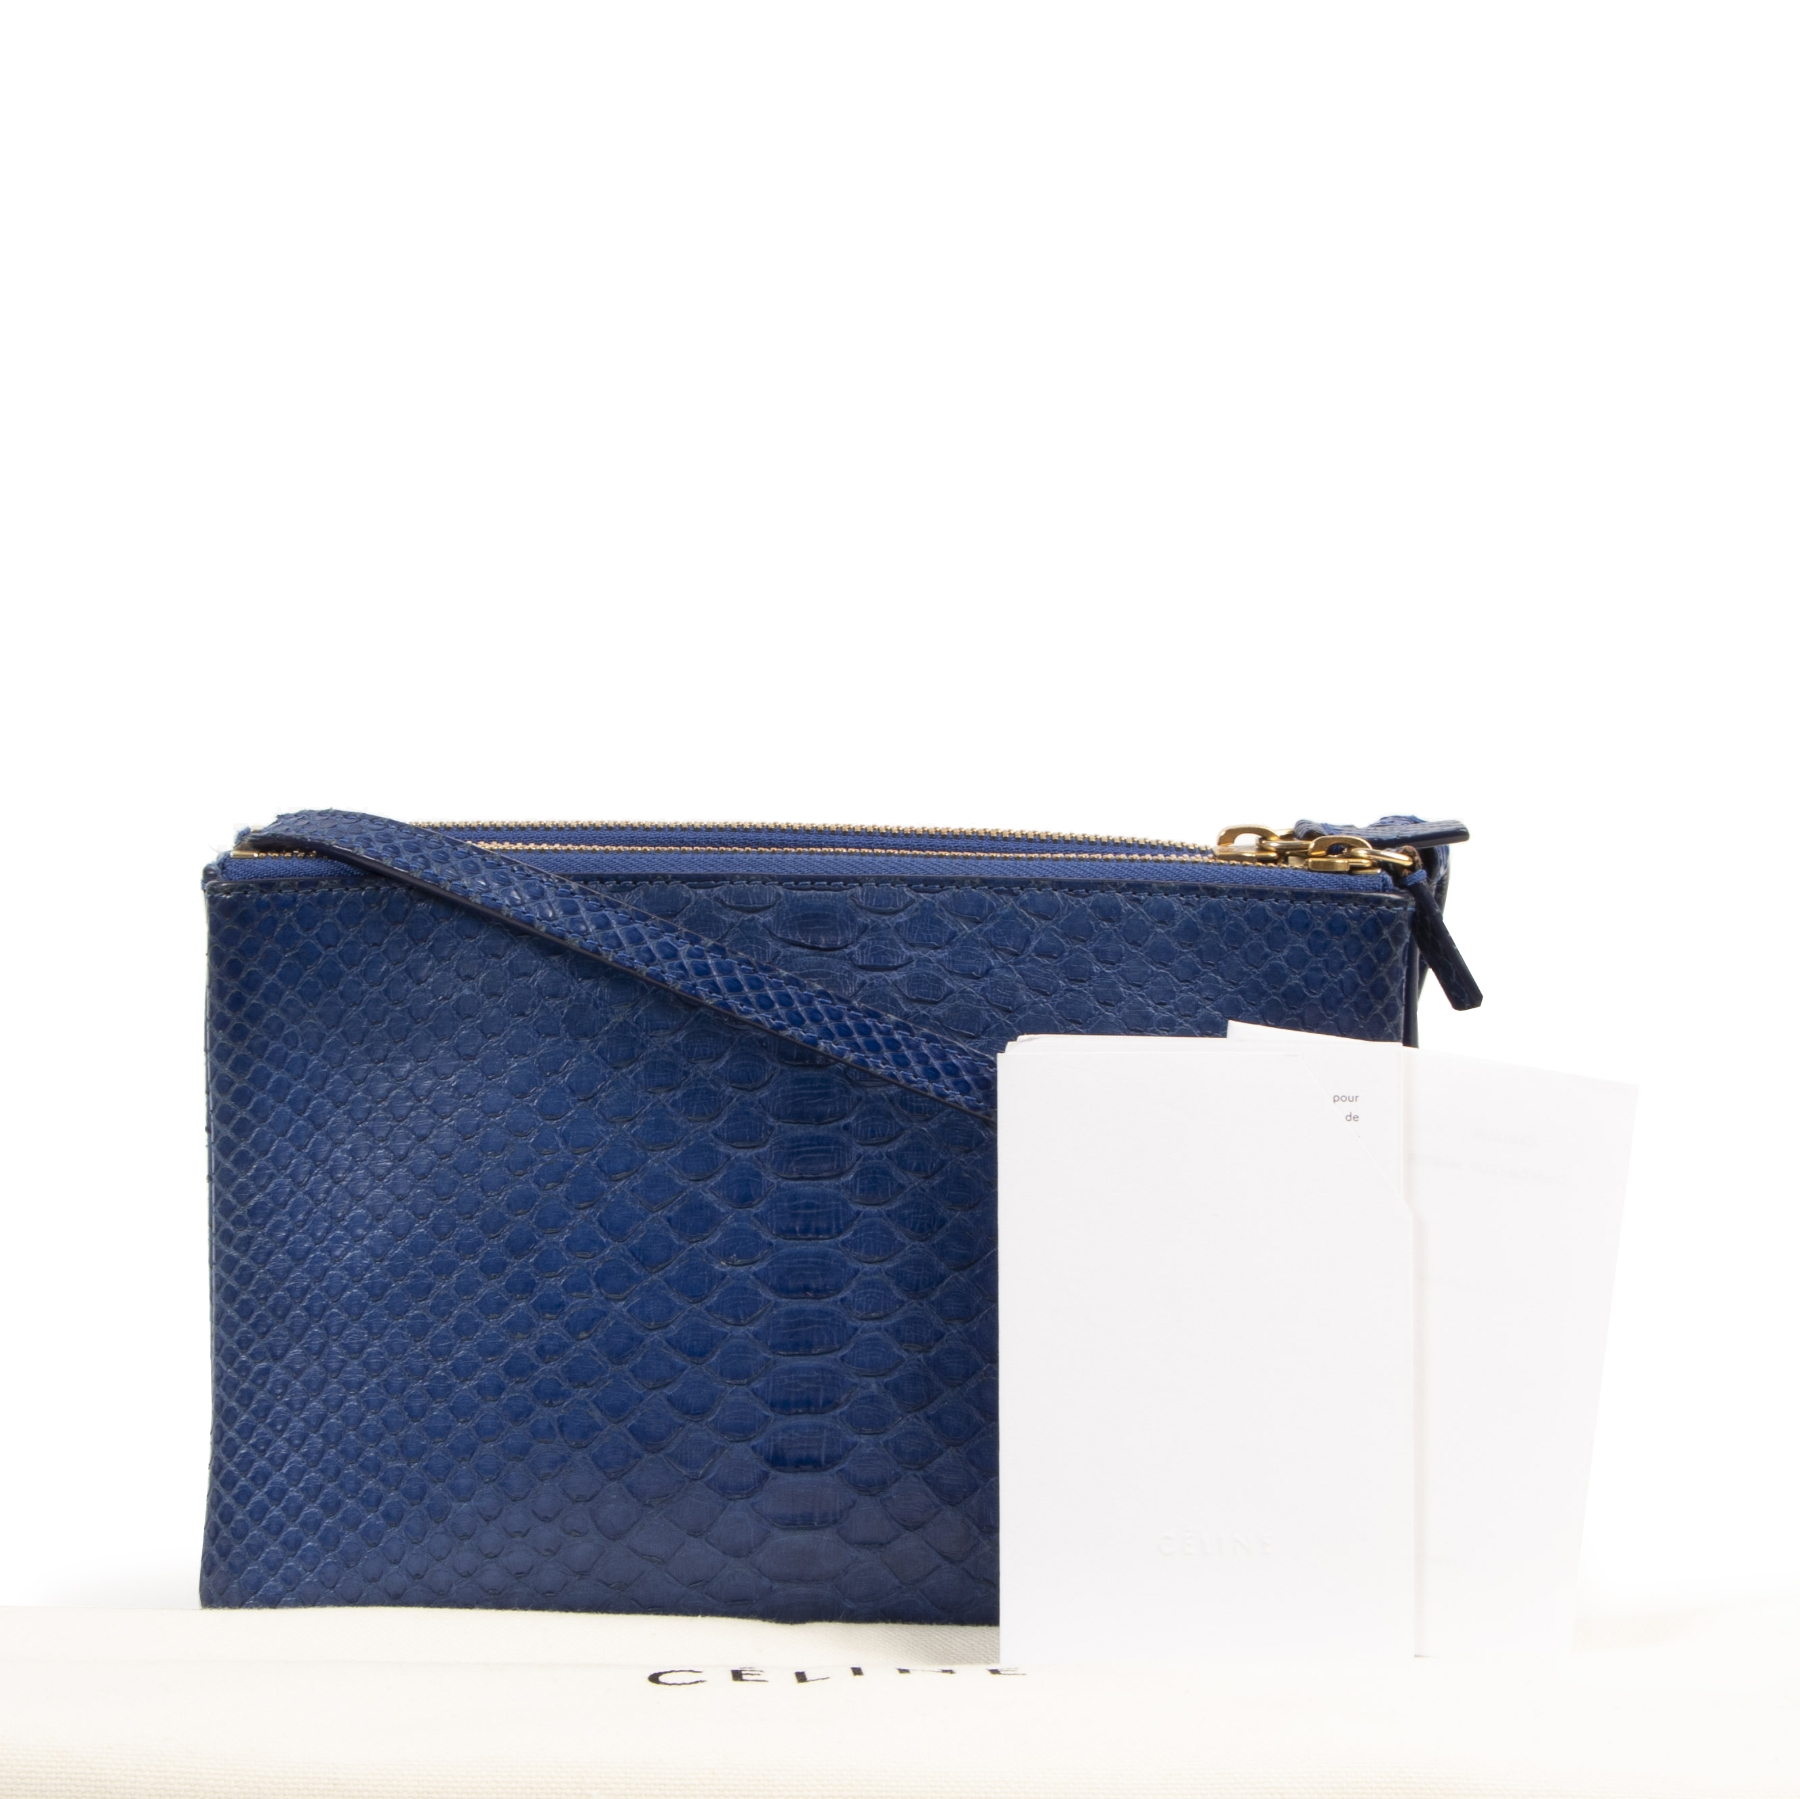 Authentieke tweedehands vintage Céline Trio Python Crossbody Bag koop online webshop LabelLOV